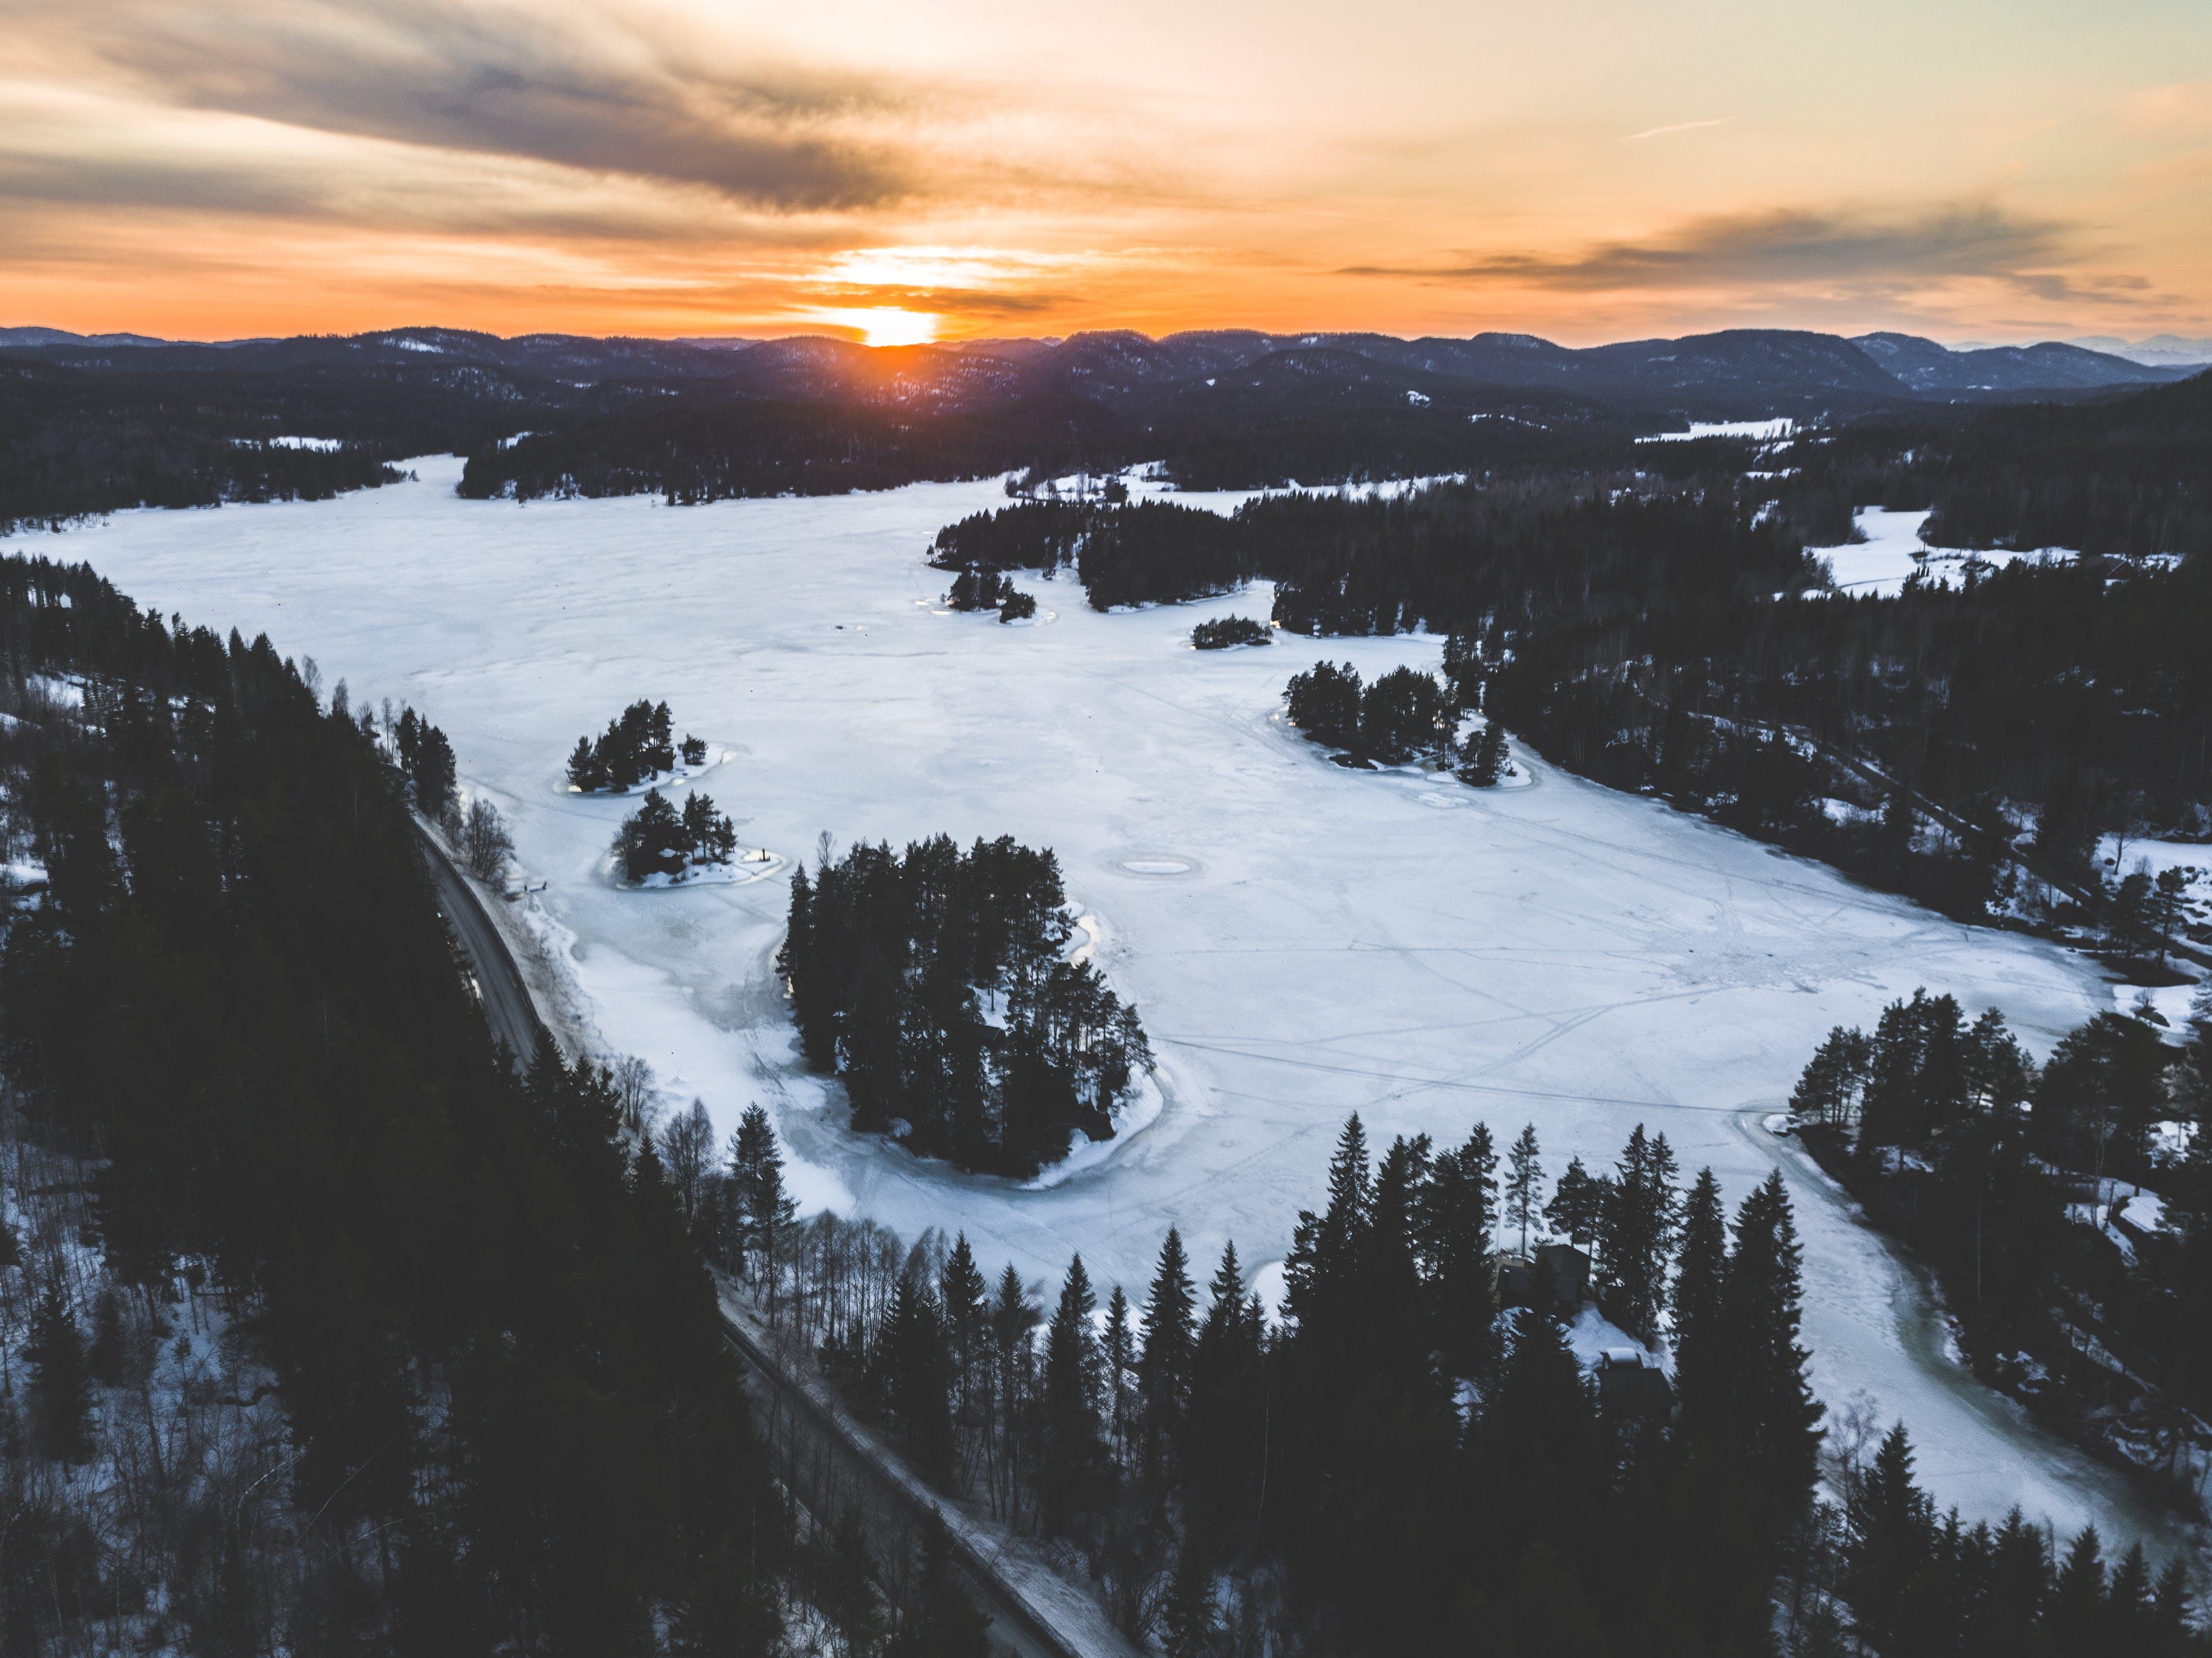 Snowfield Near Green Trees in Aerial Shot